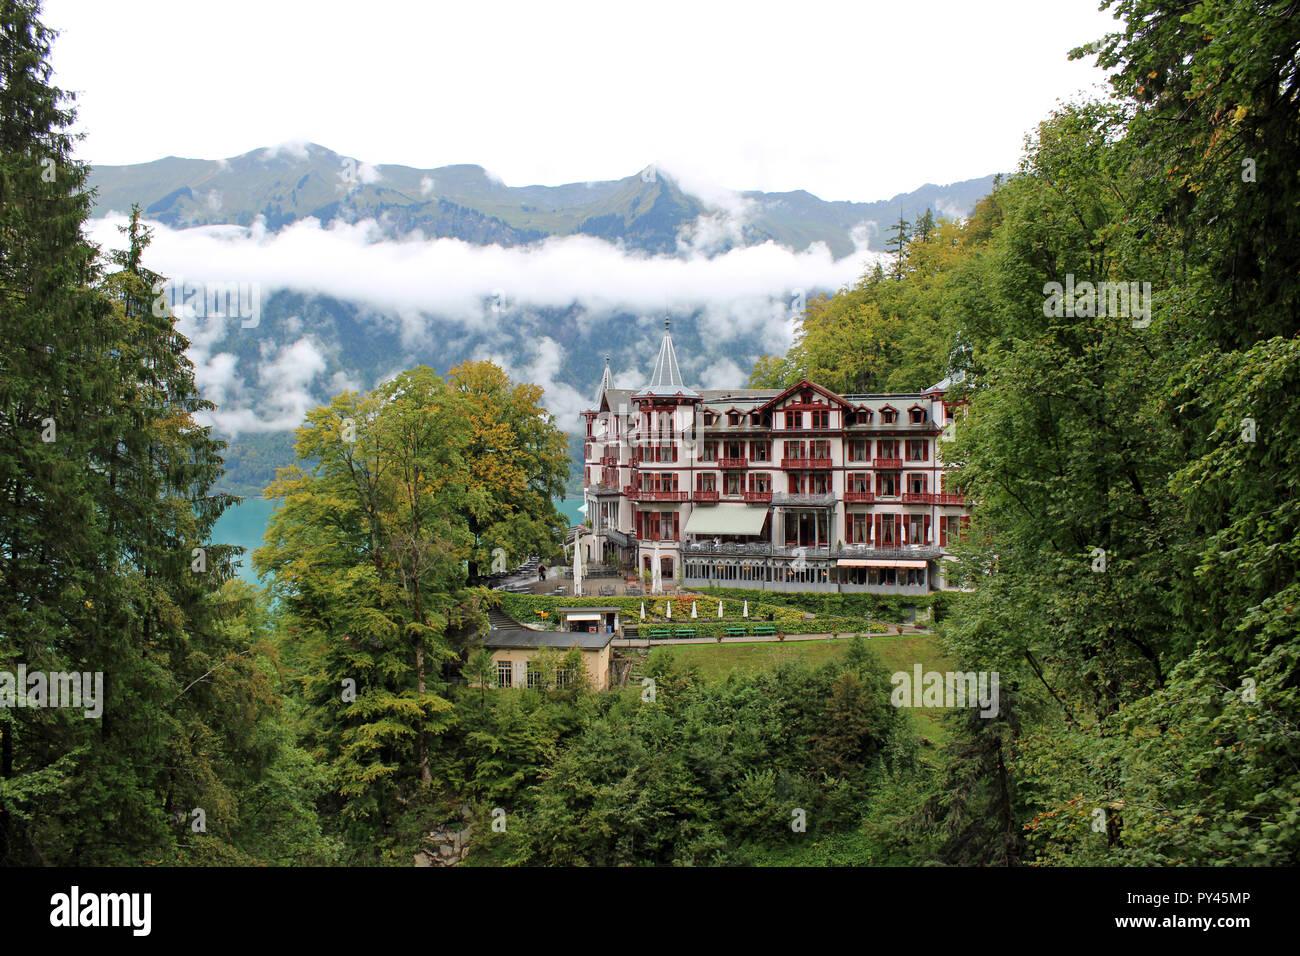 Grandhotel Giessbach Brienz Switzerland. 4 star romantic Grandhotel reached by private funicular from Lake Brienz Interlaken Stunning views.Waterfalls Stock Photo